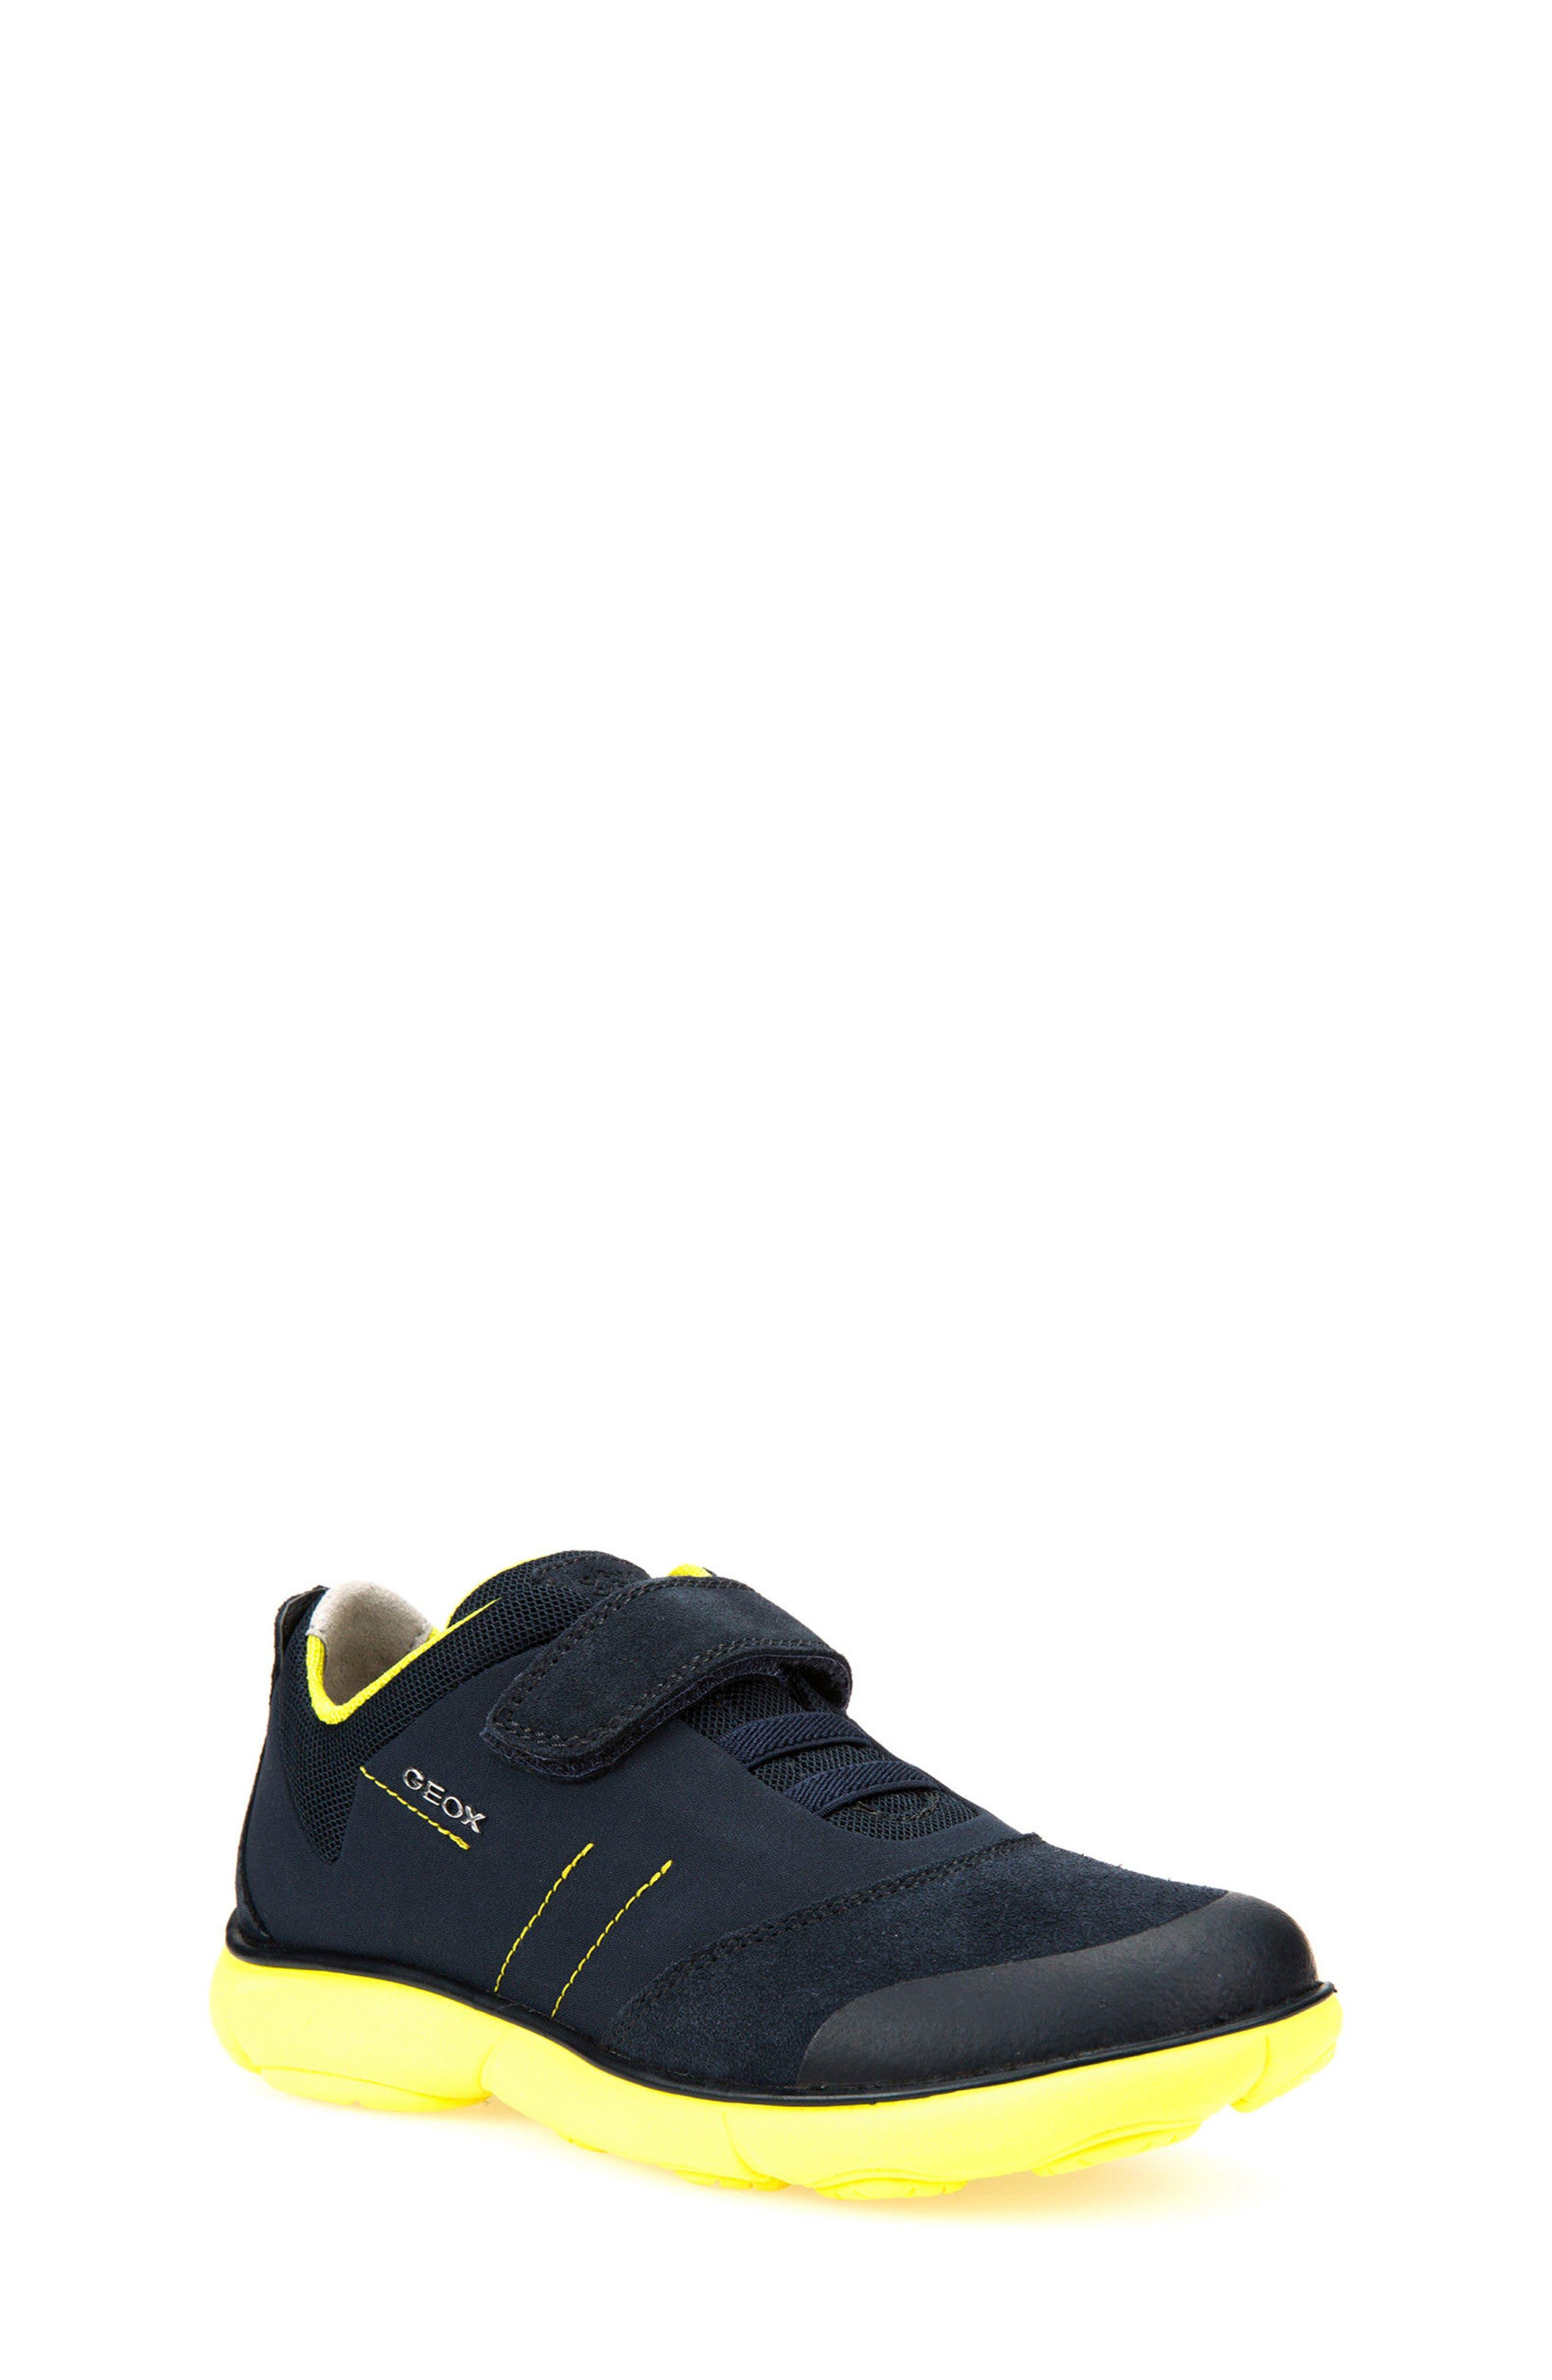 Geox Nebula Low Top Sneaker (Toddler, Little Kid & Big Kid)